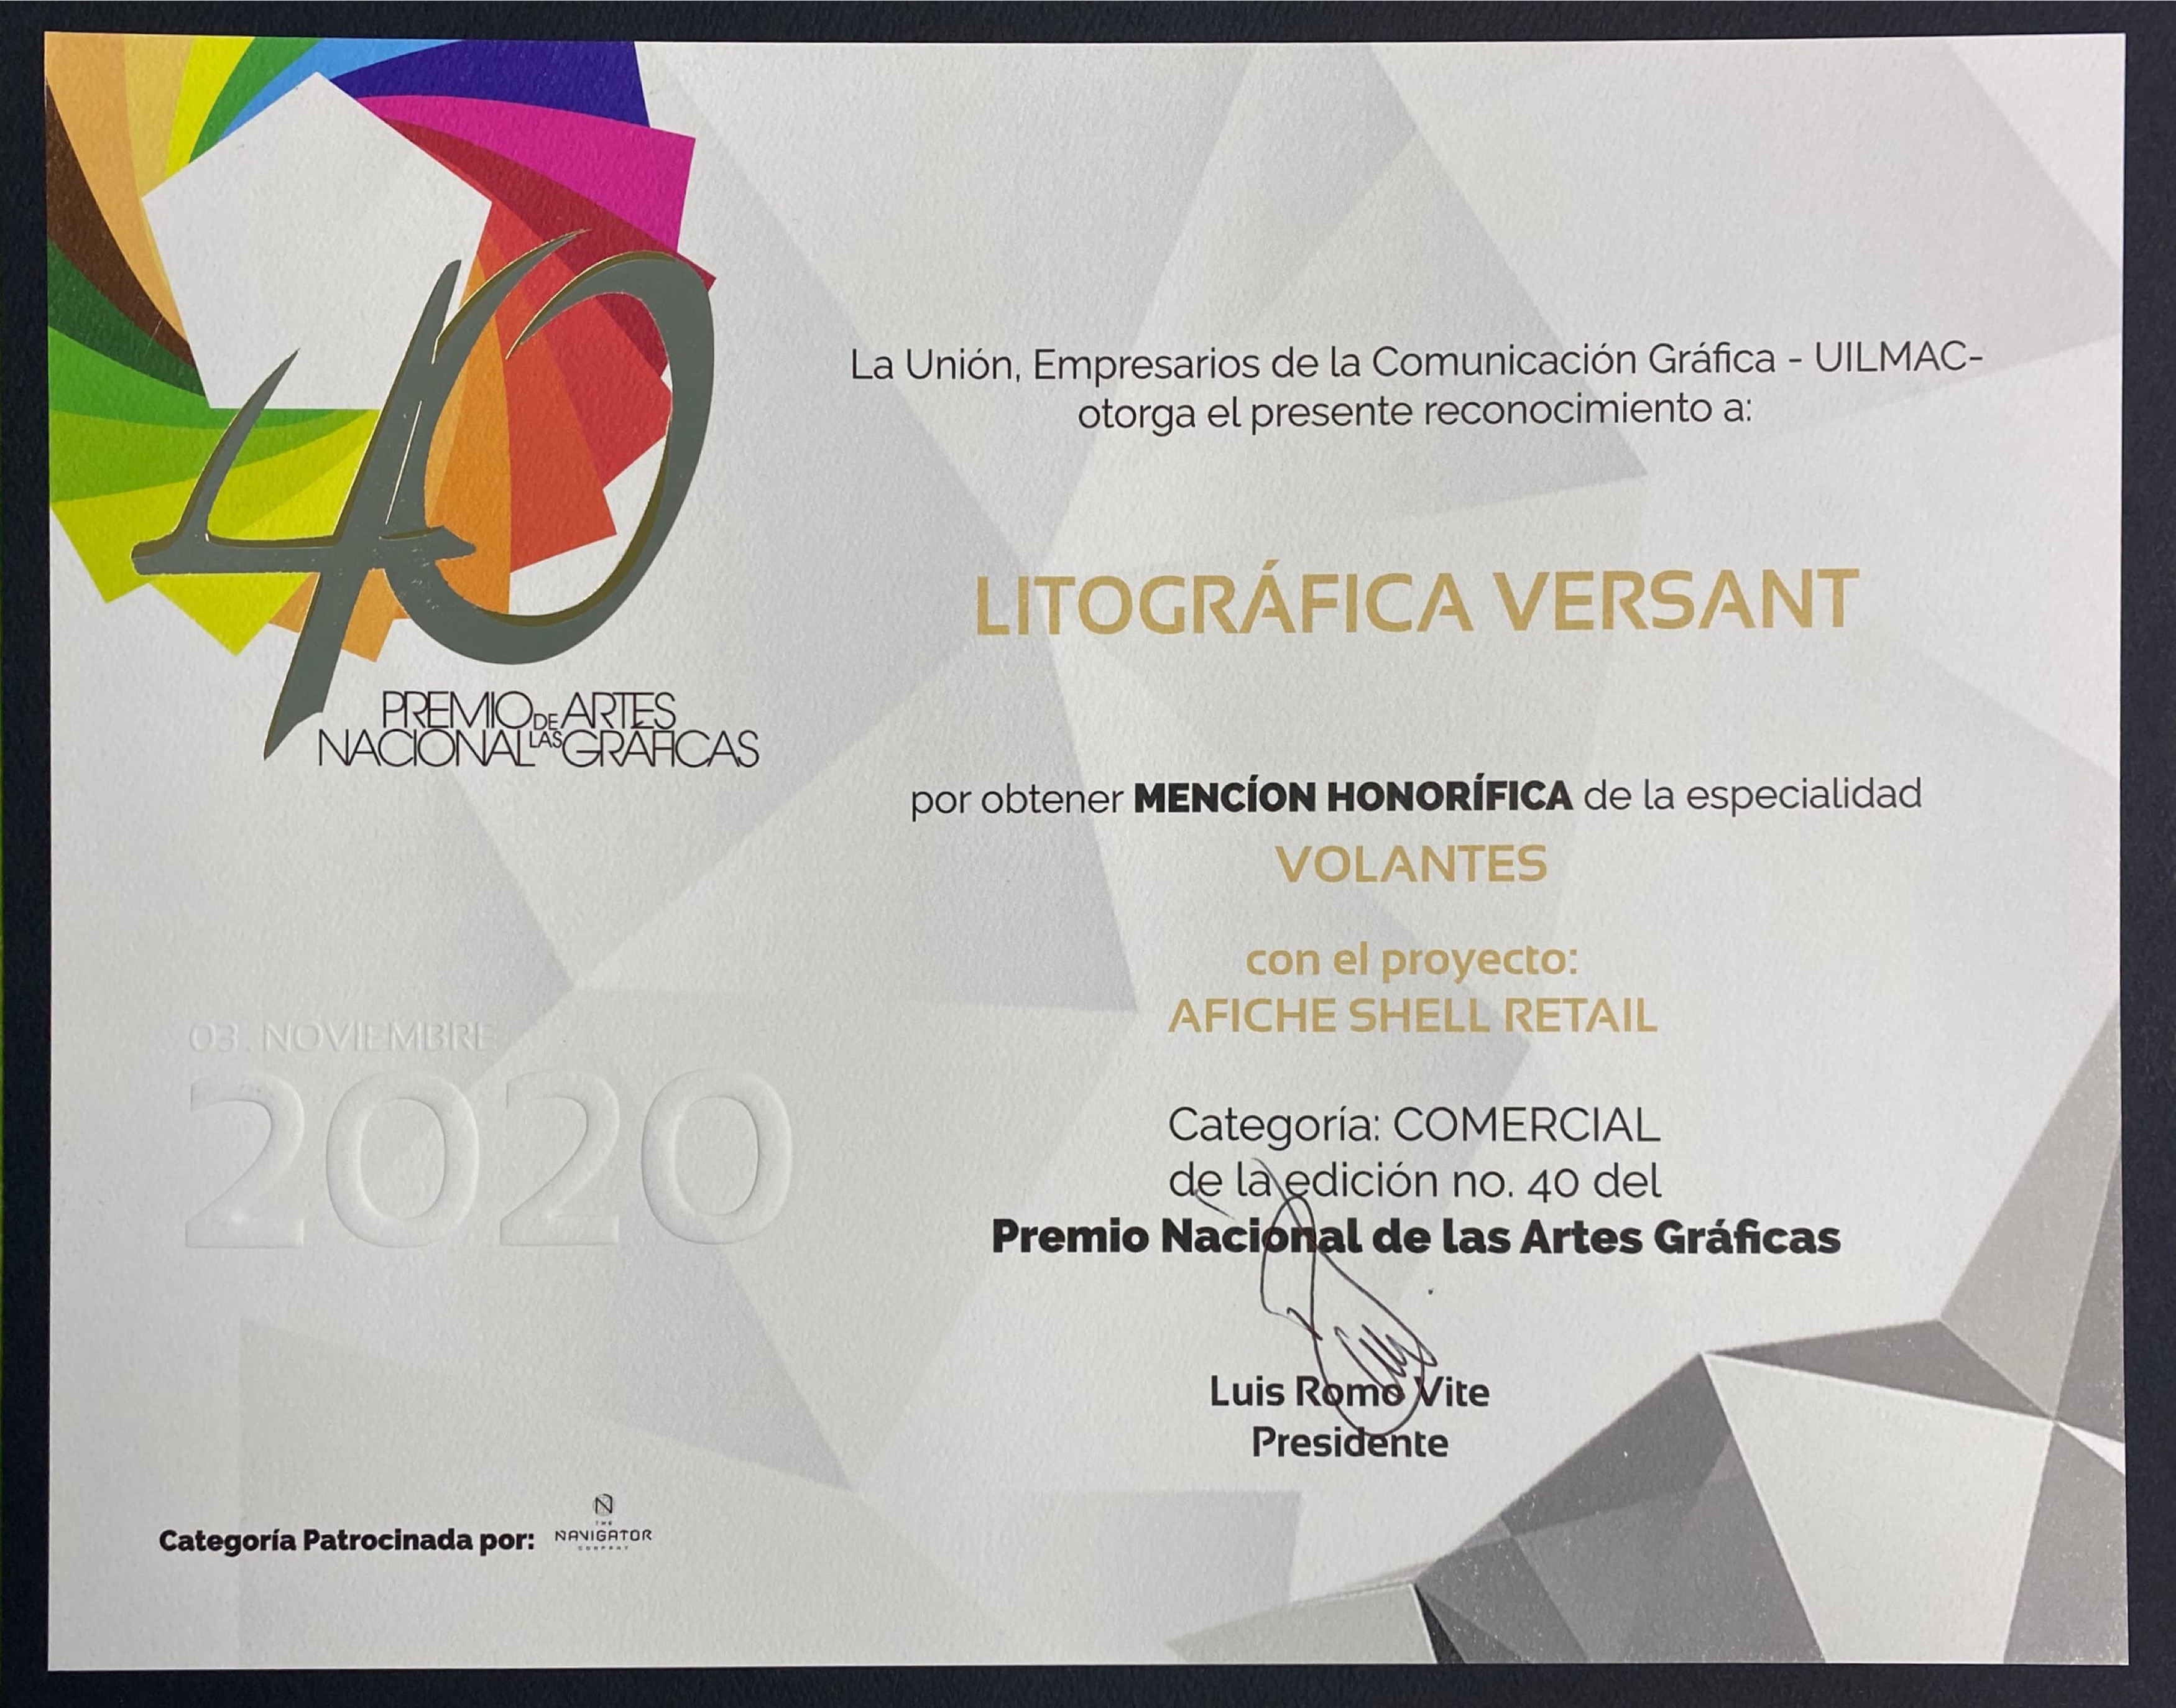 Mención Honorífica PNAG 2020